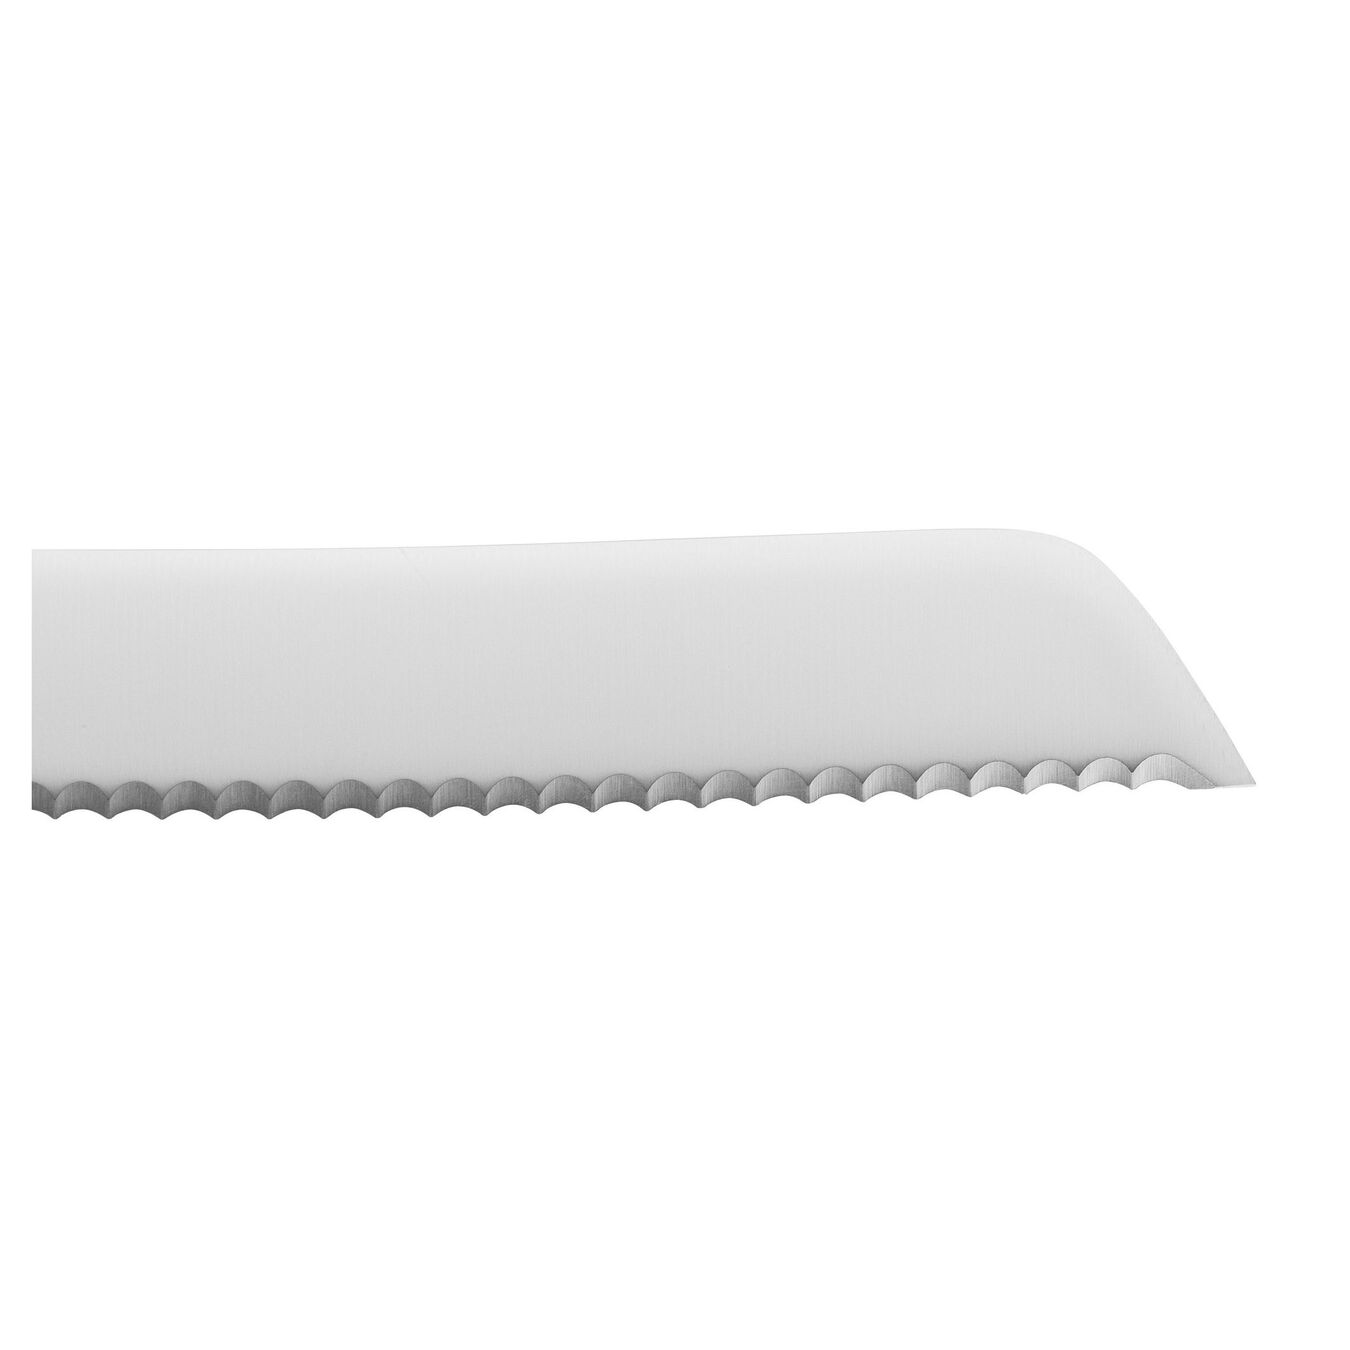 Brødkniv 20 cm,,large 2